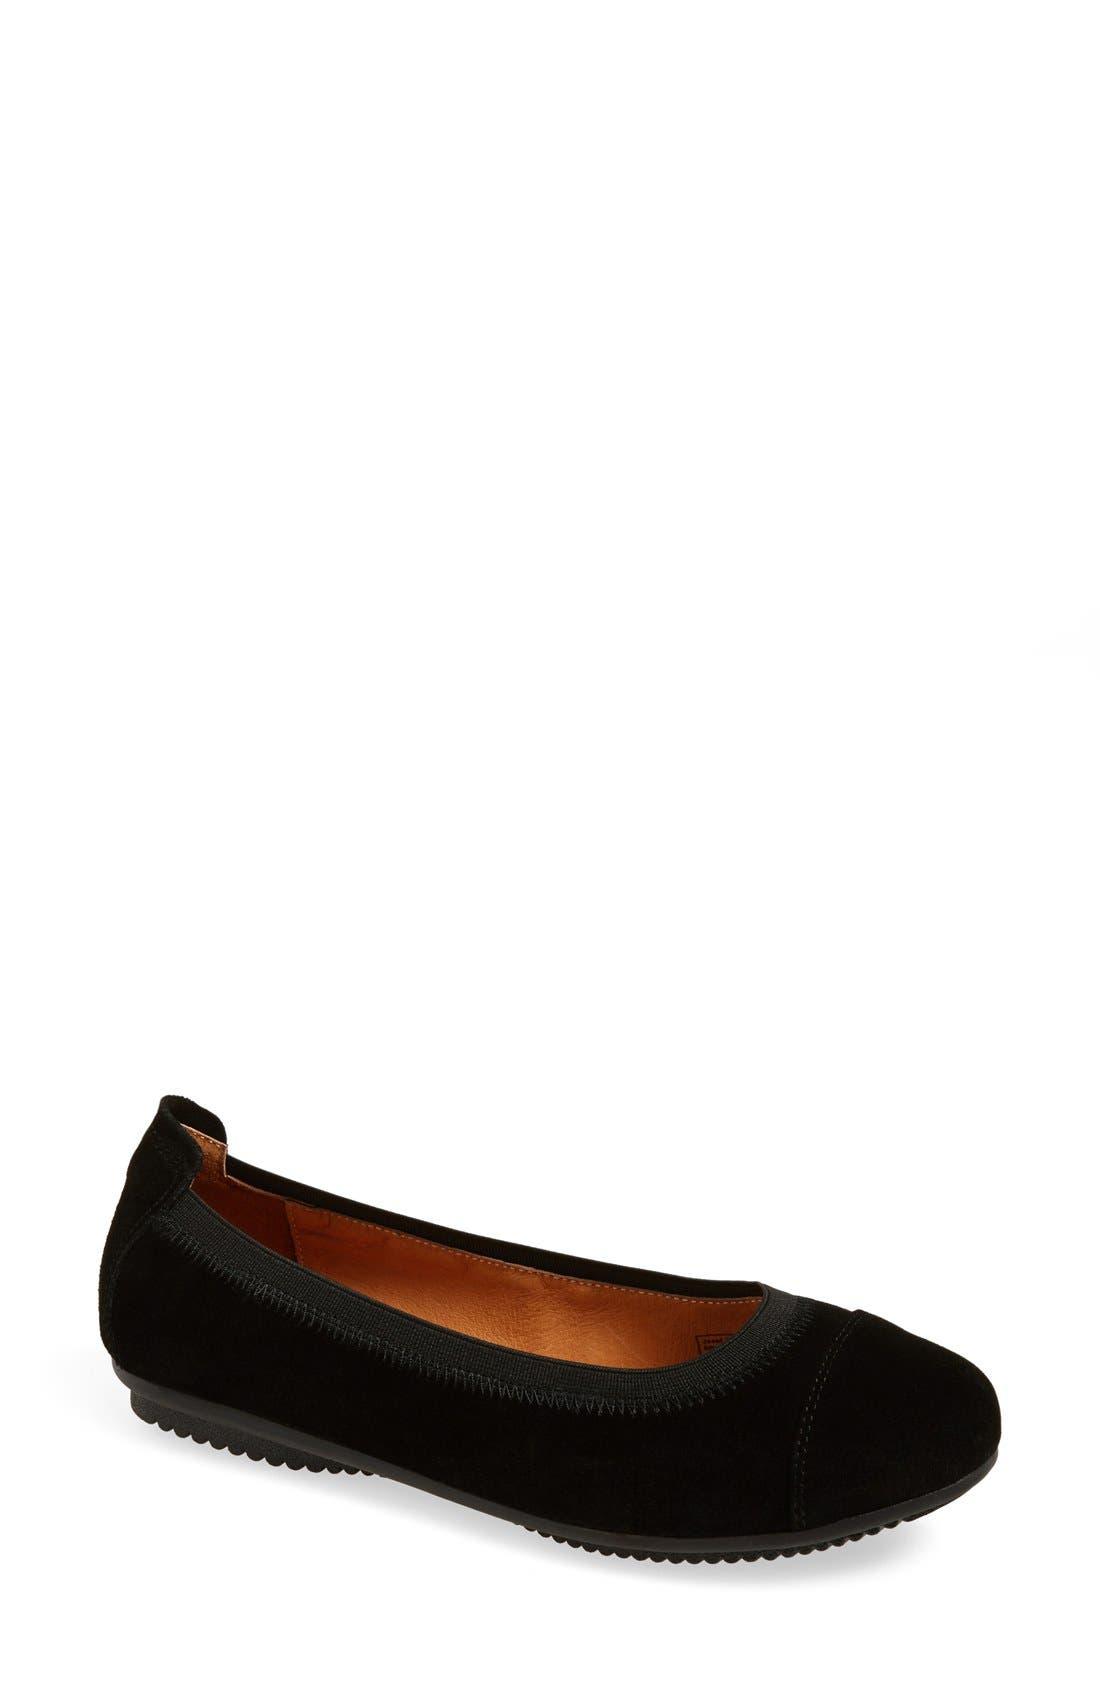 Pippa 07 Flat,                             Main thumbnail 1, color,                             Black Suede